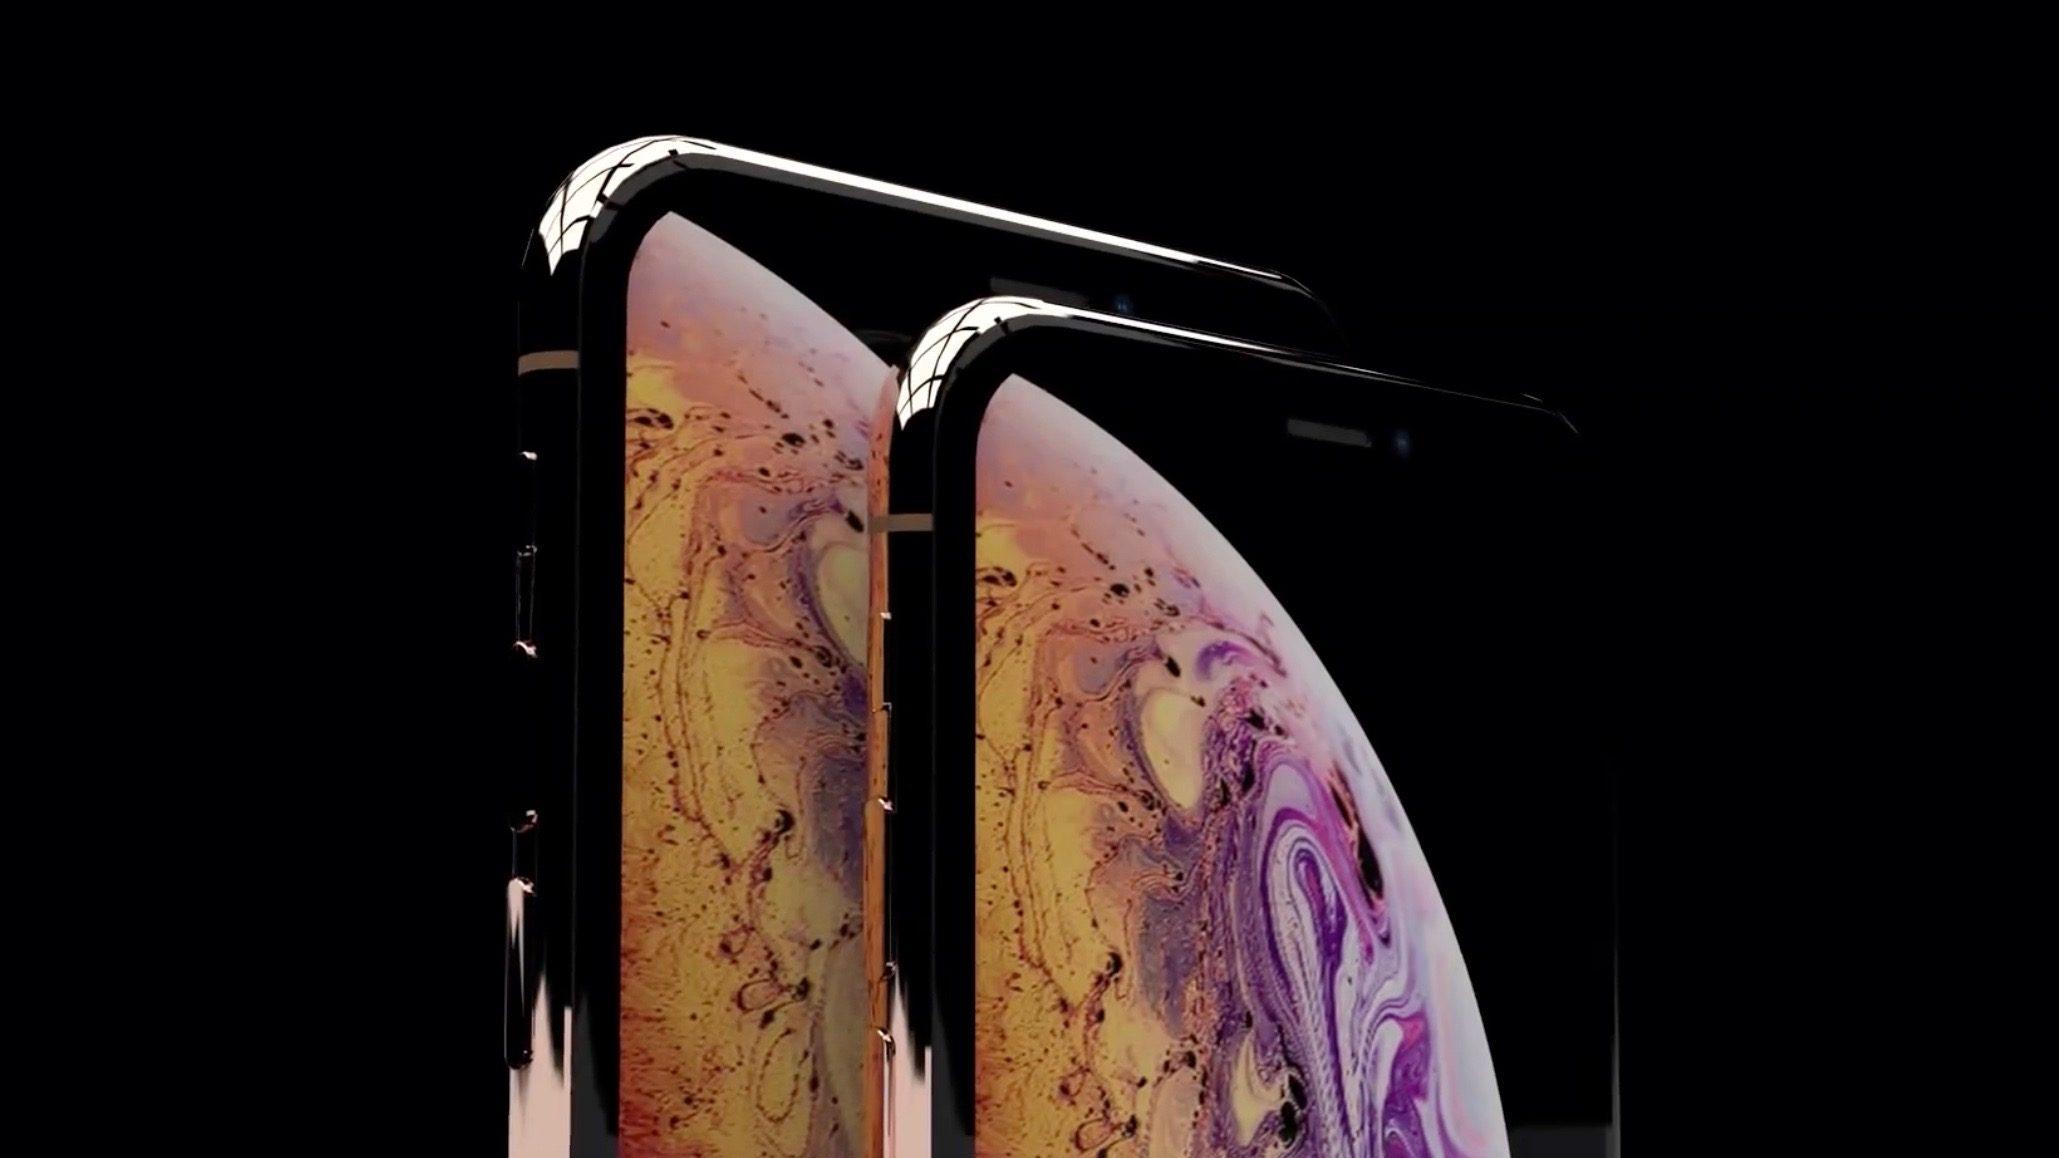 iPhone XS 金黑機身更搶眼? 最新相片+官方宣傳片現身